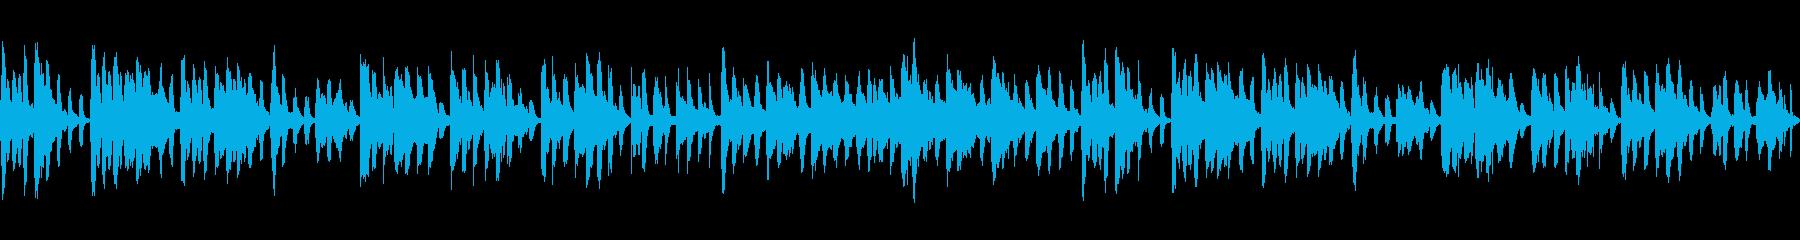 Cartoon ストリングス 電子...の再生済みの波形